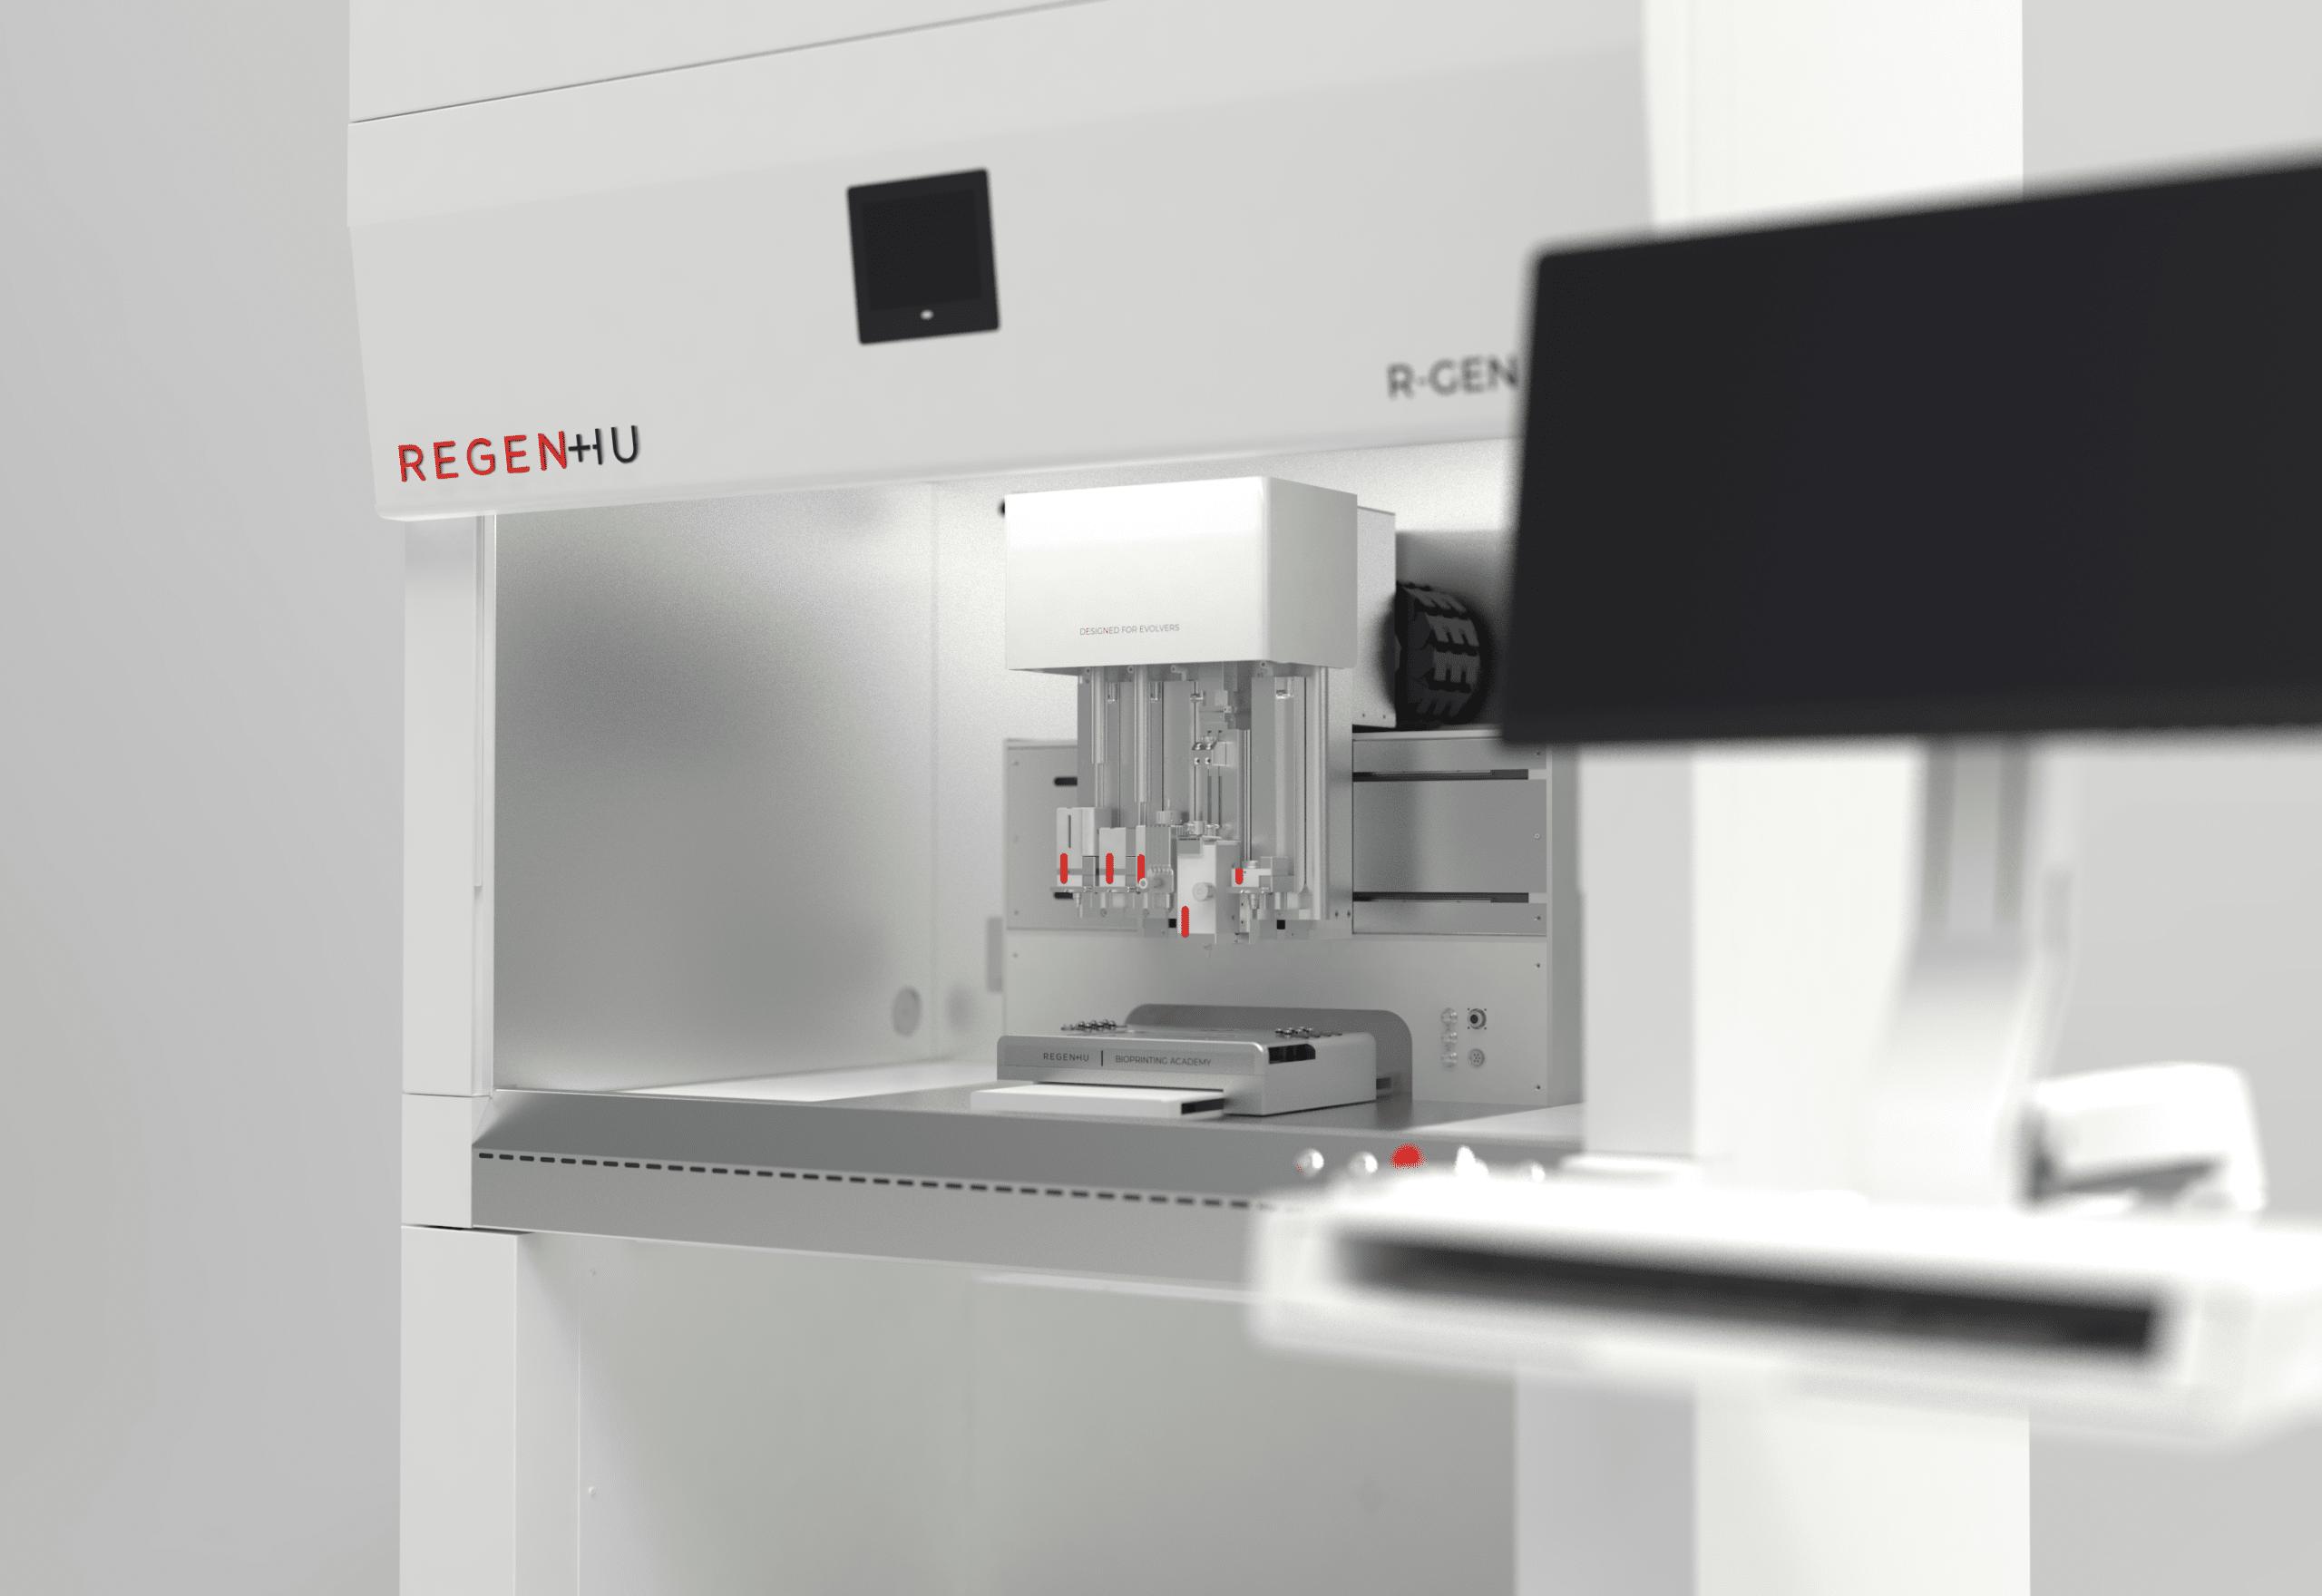 R-GEN-200-REGENHU-Switzerland-3d-bioprinting-instrument-bio-3d-bioprinters-fresh-printing-printheads-modularity-biosafety-cabinets-closeup-002